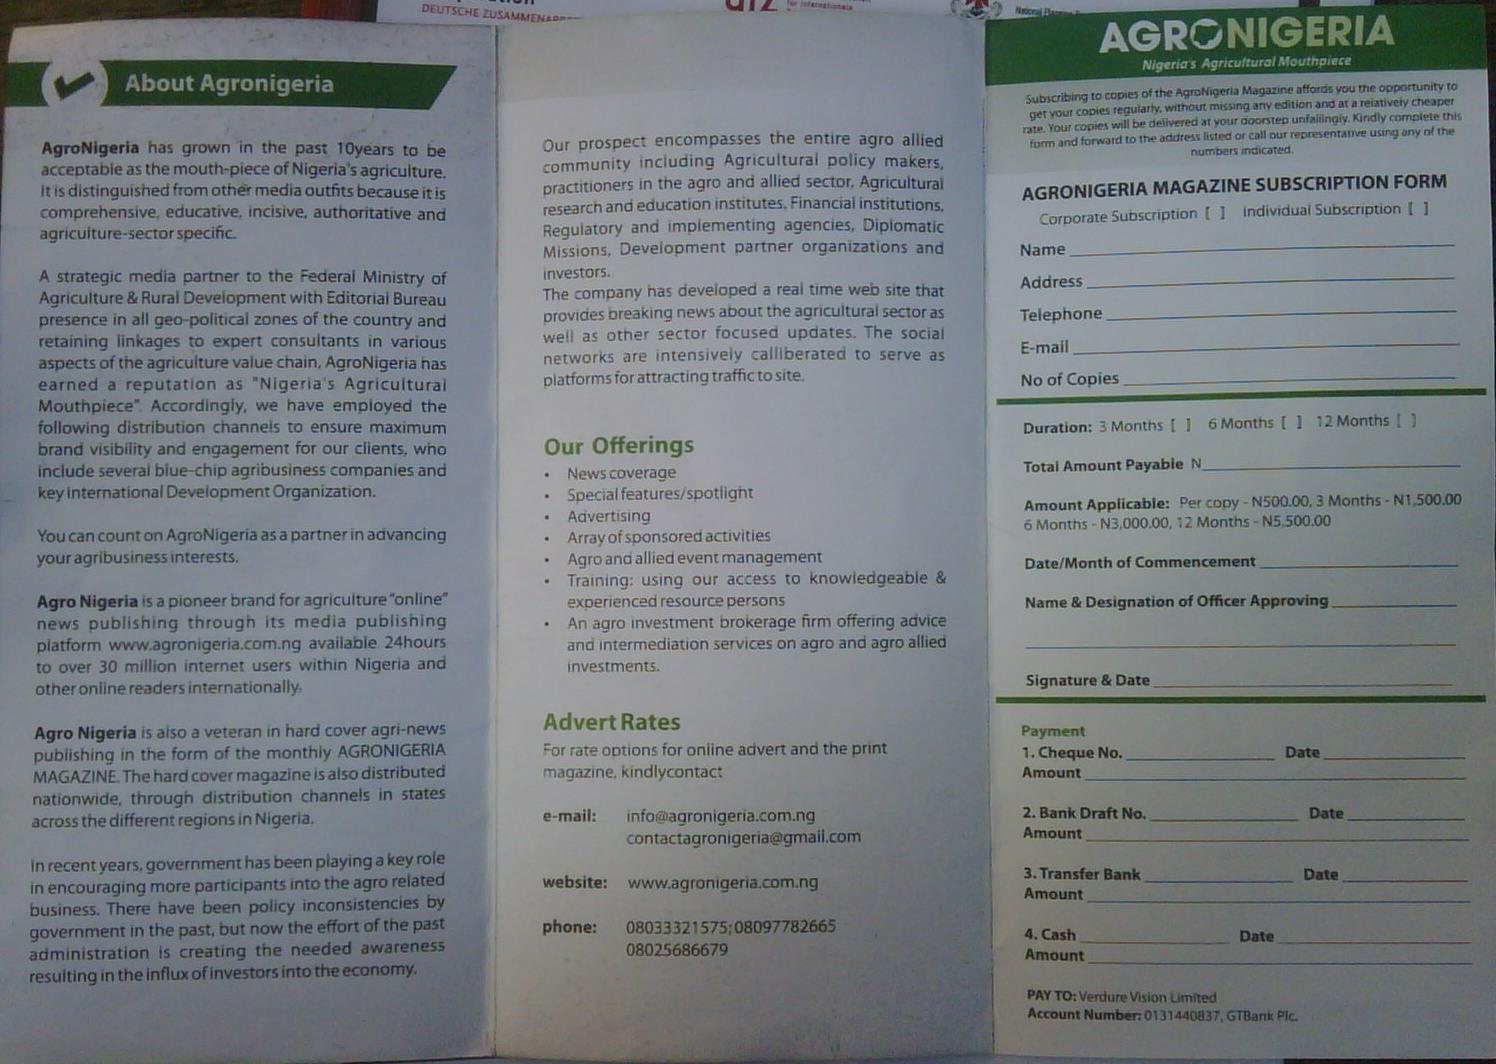 agronigeria 2